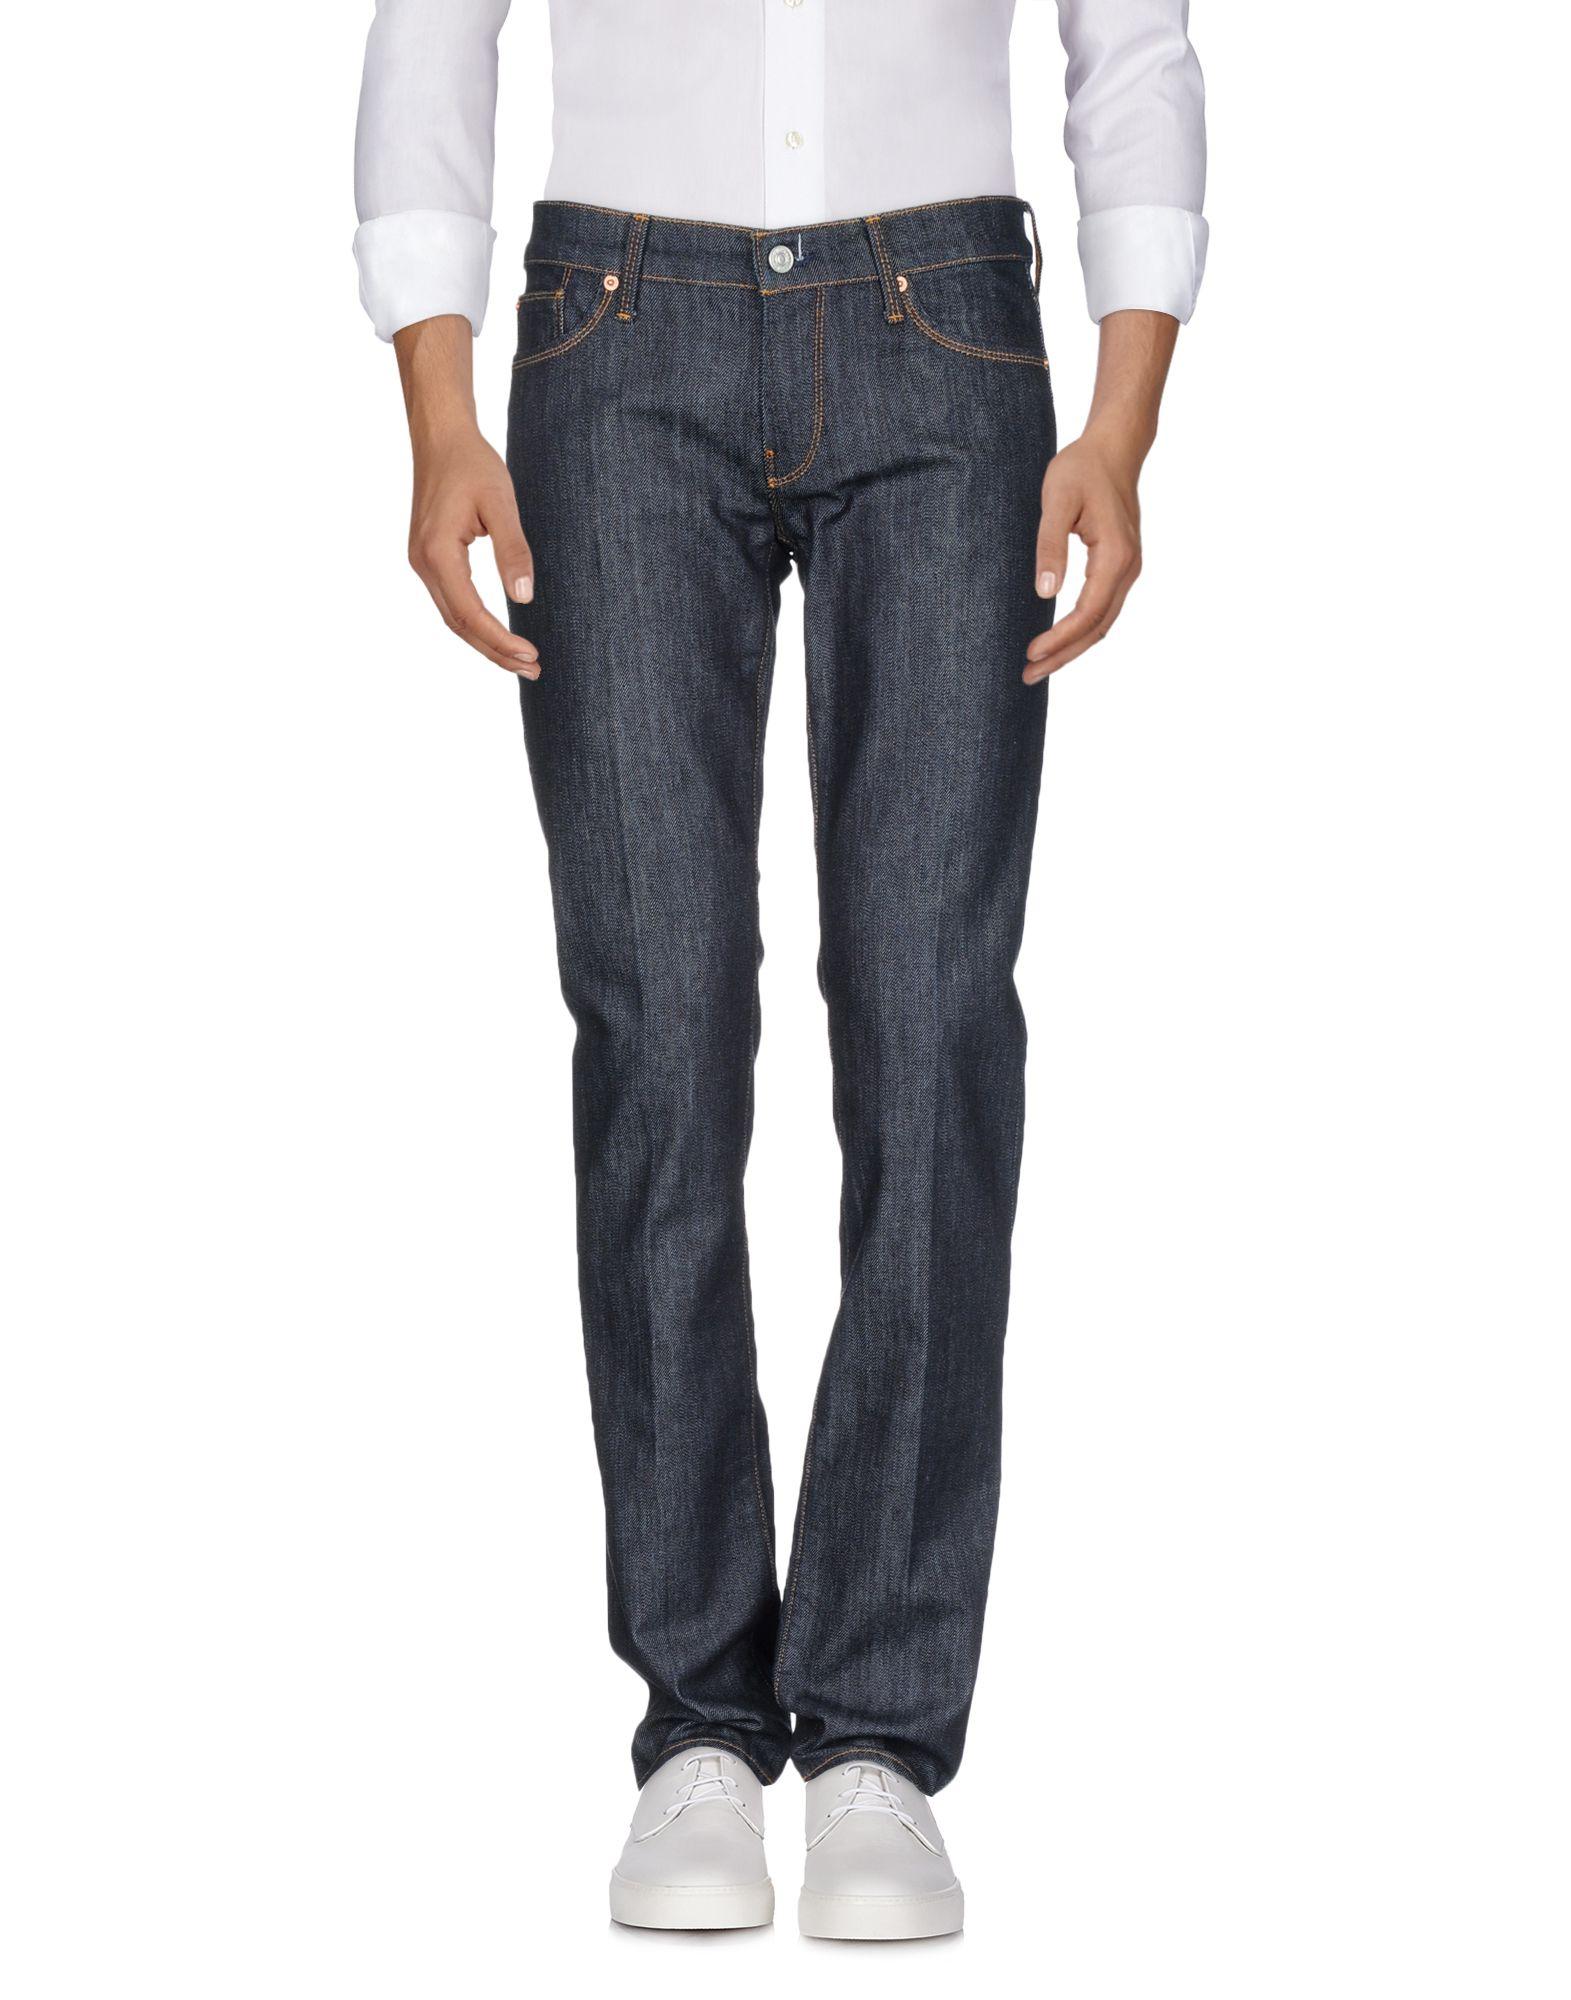 Pantaloni Jeans Dior Homme Uomo - Acquista online su